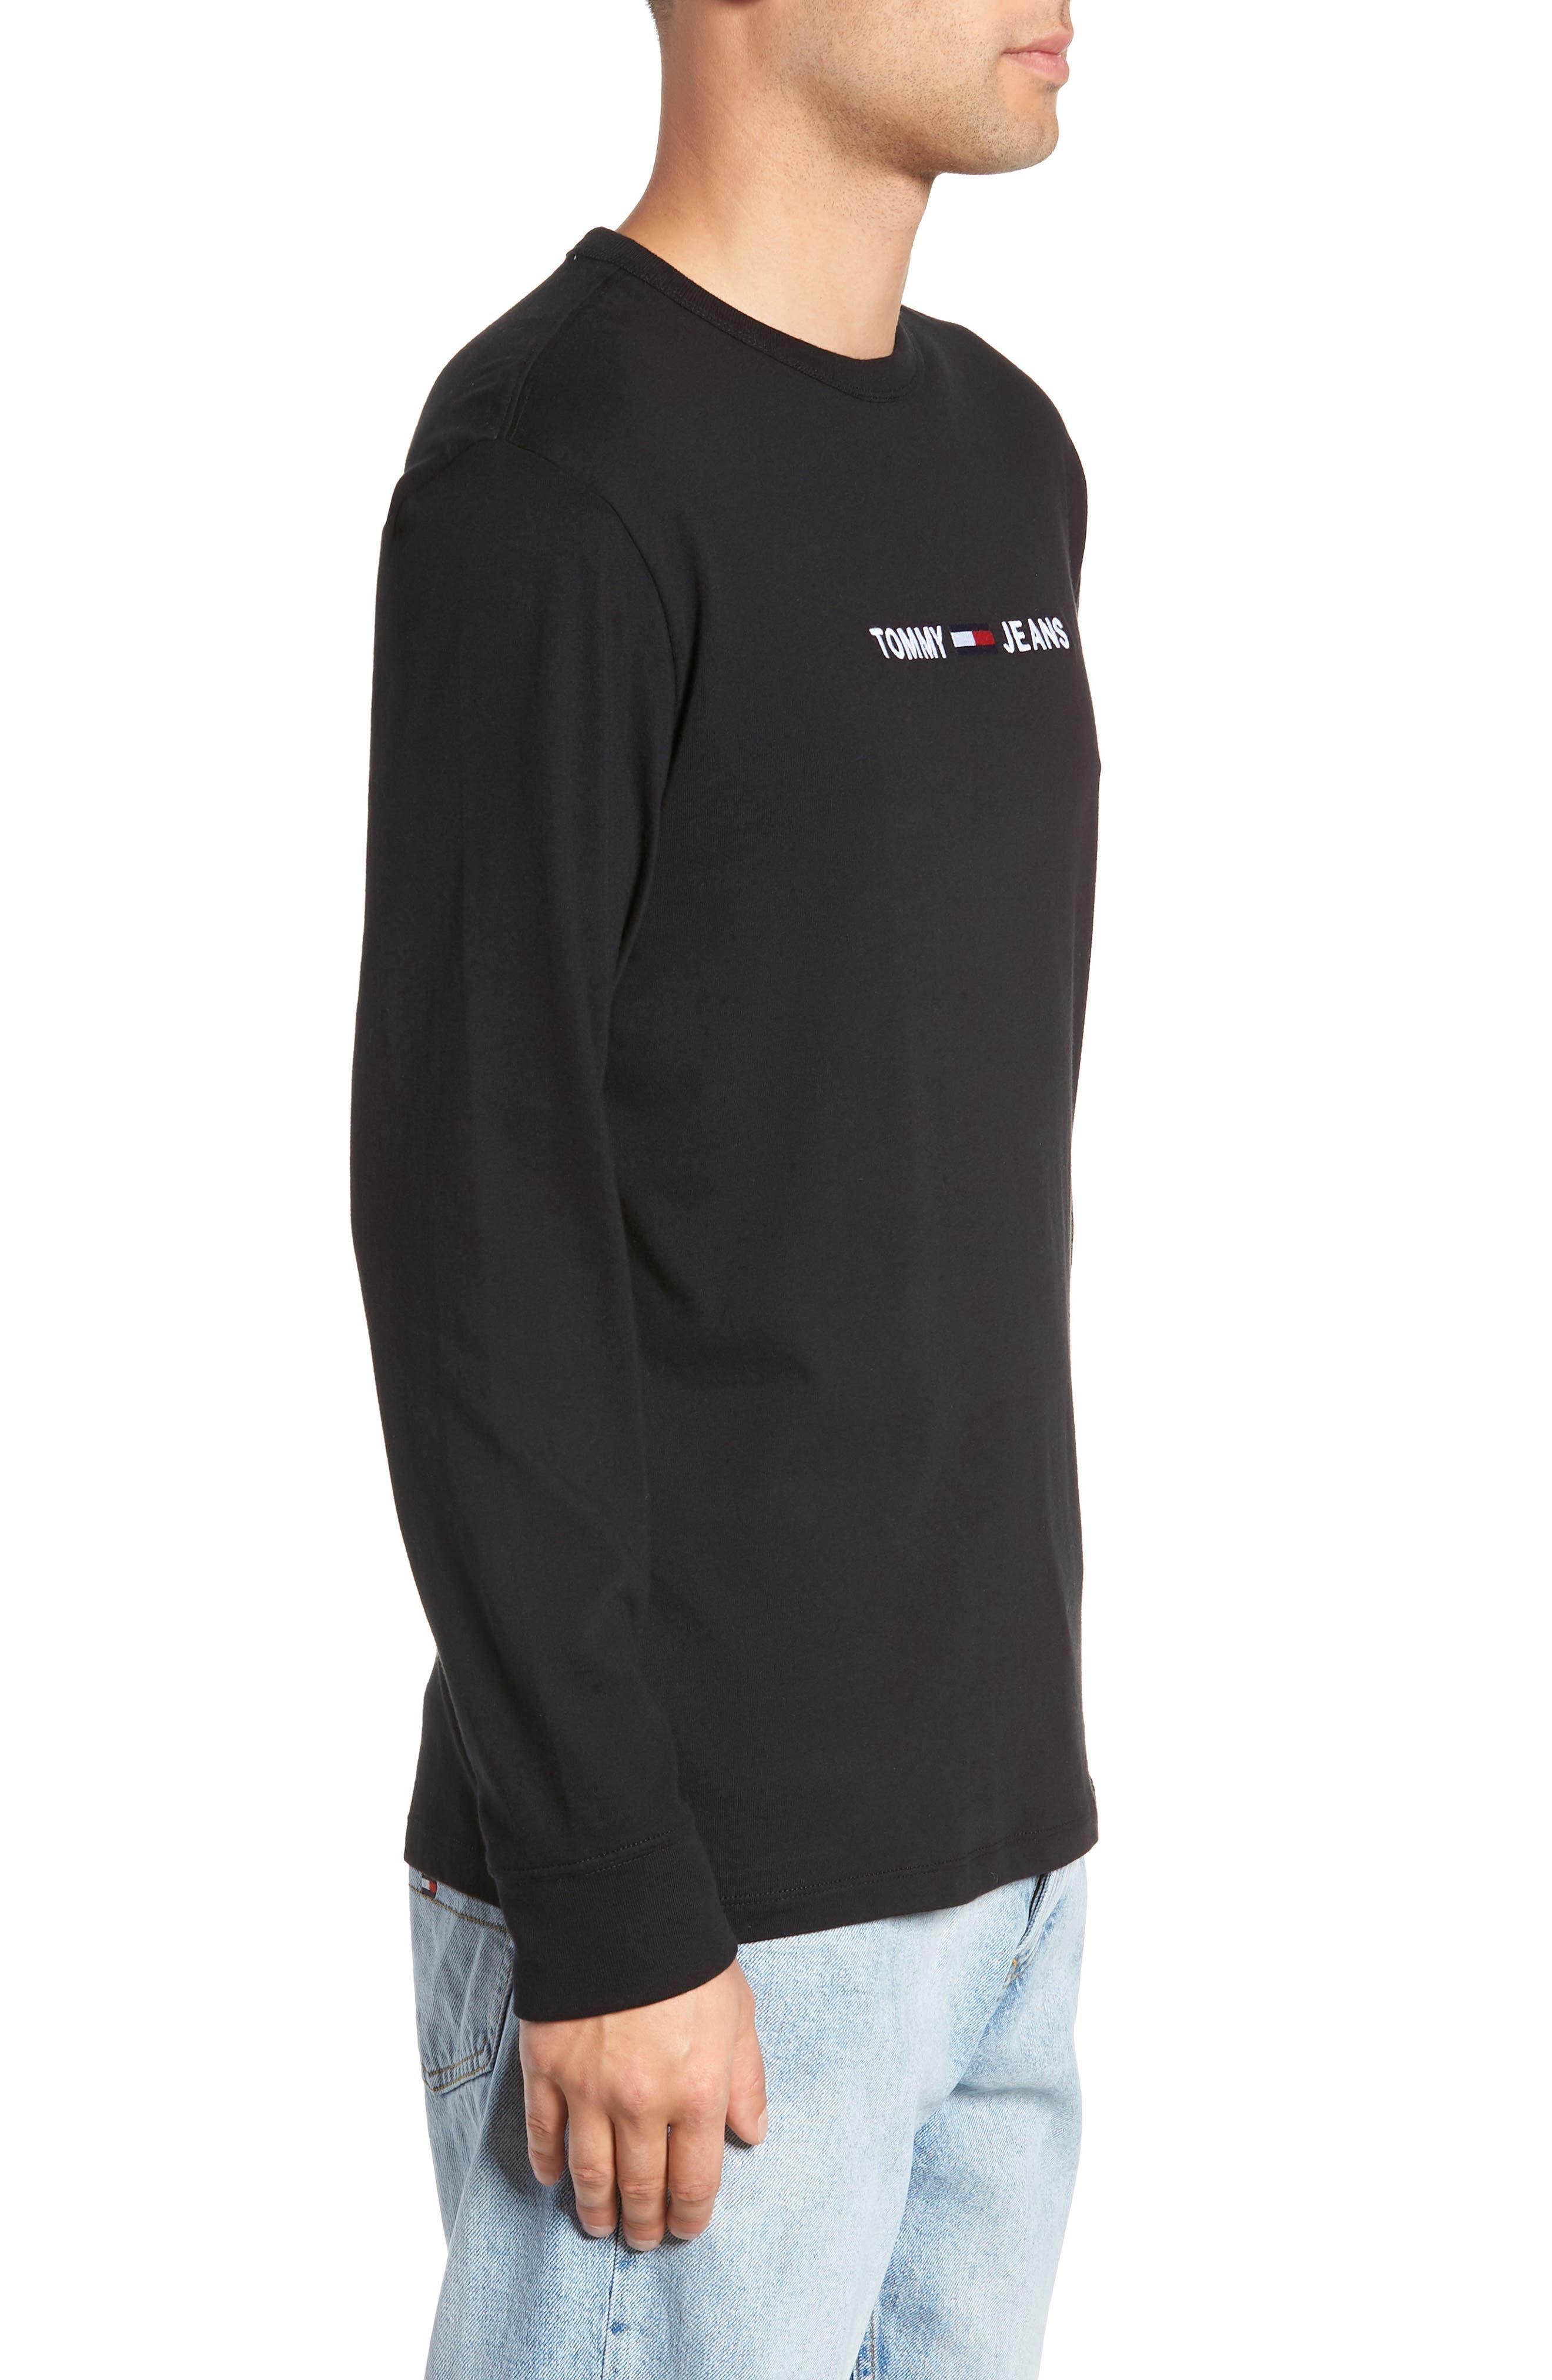 TOMMY JEANS,                             TJM Logo Graphic Long Sleeve T-Shirt,                             Alternate thumbnail 3, color,                             001